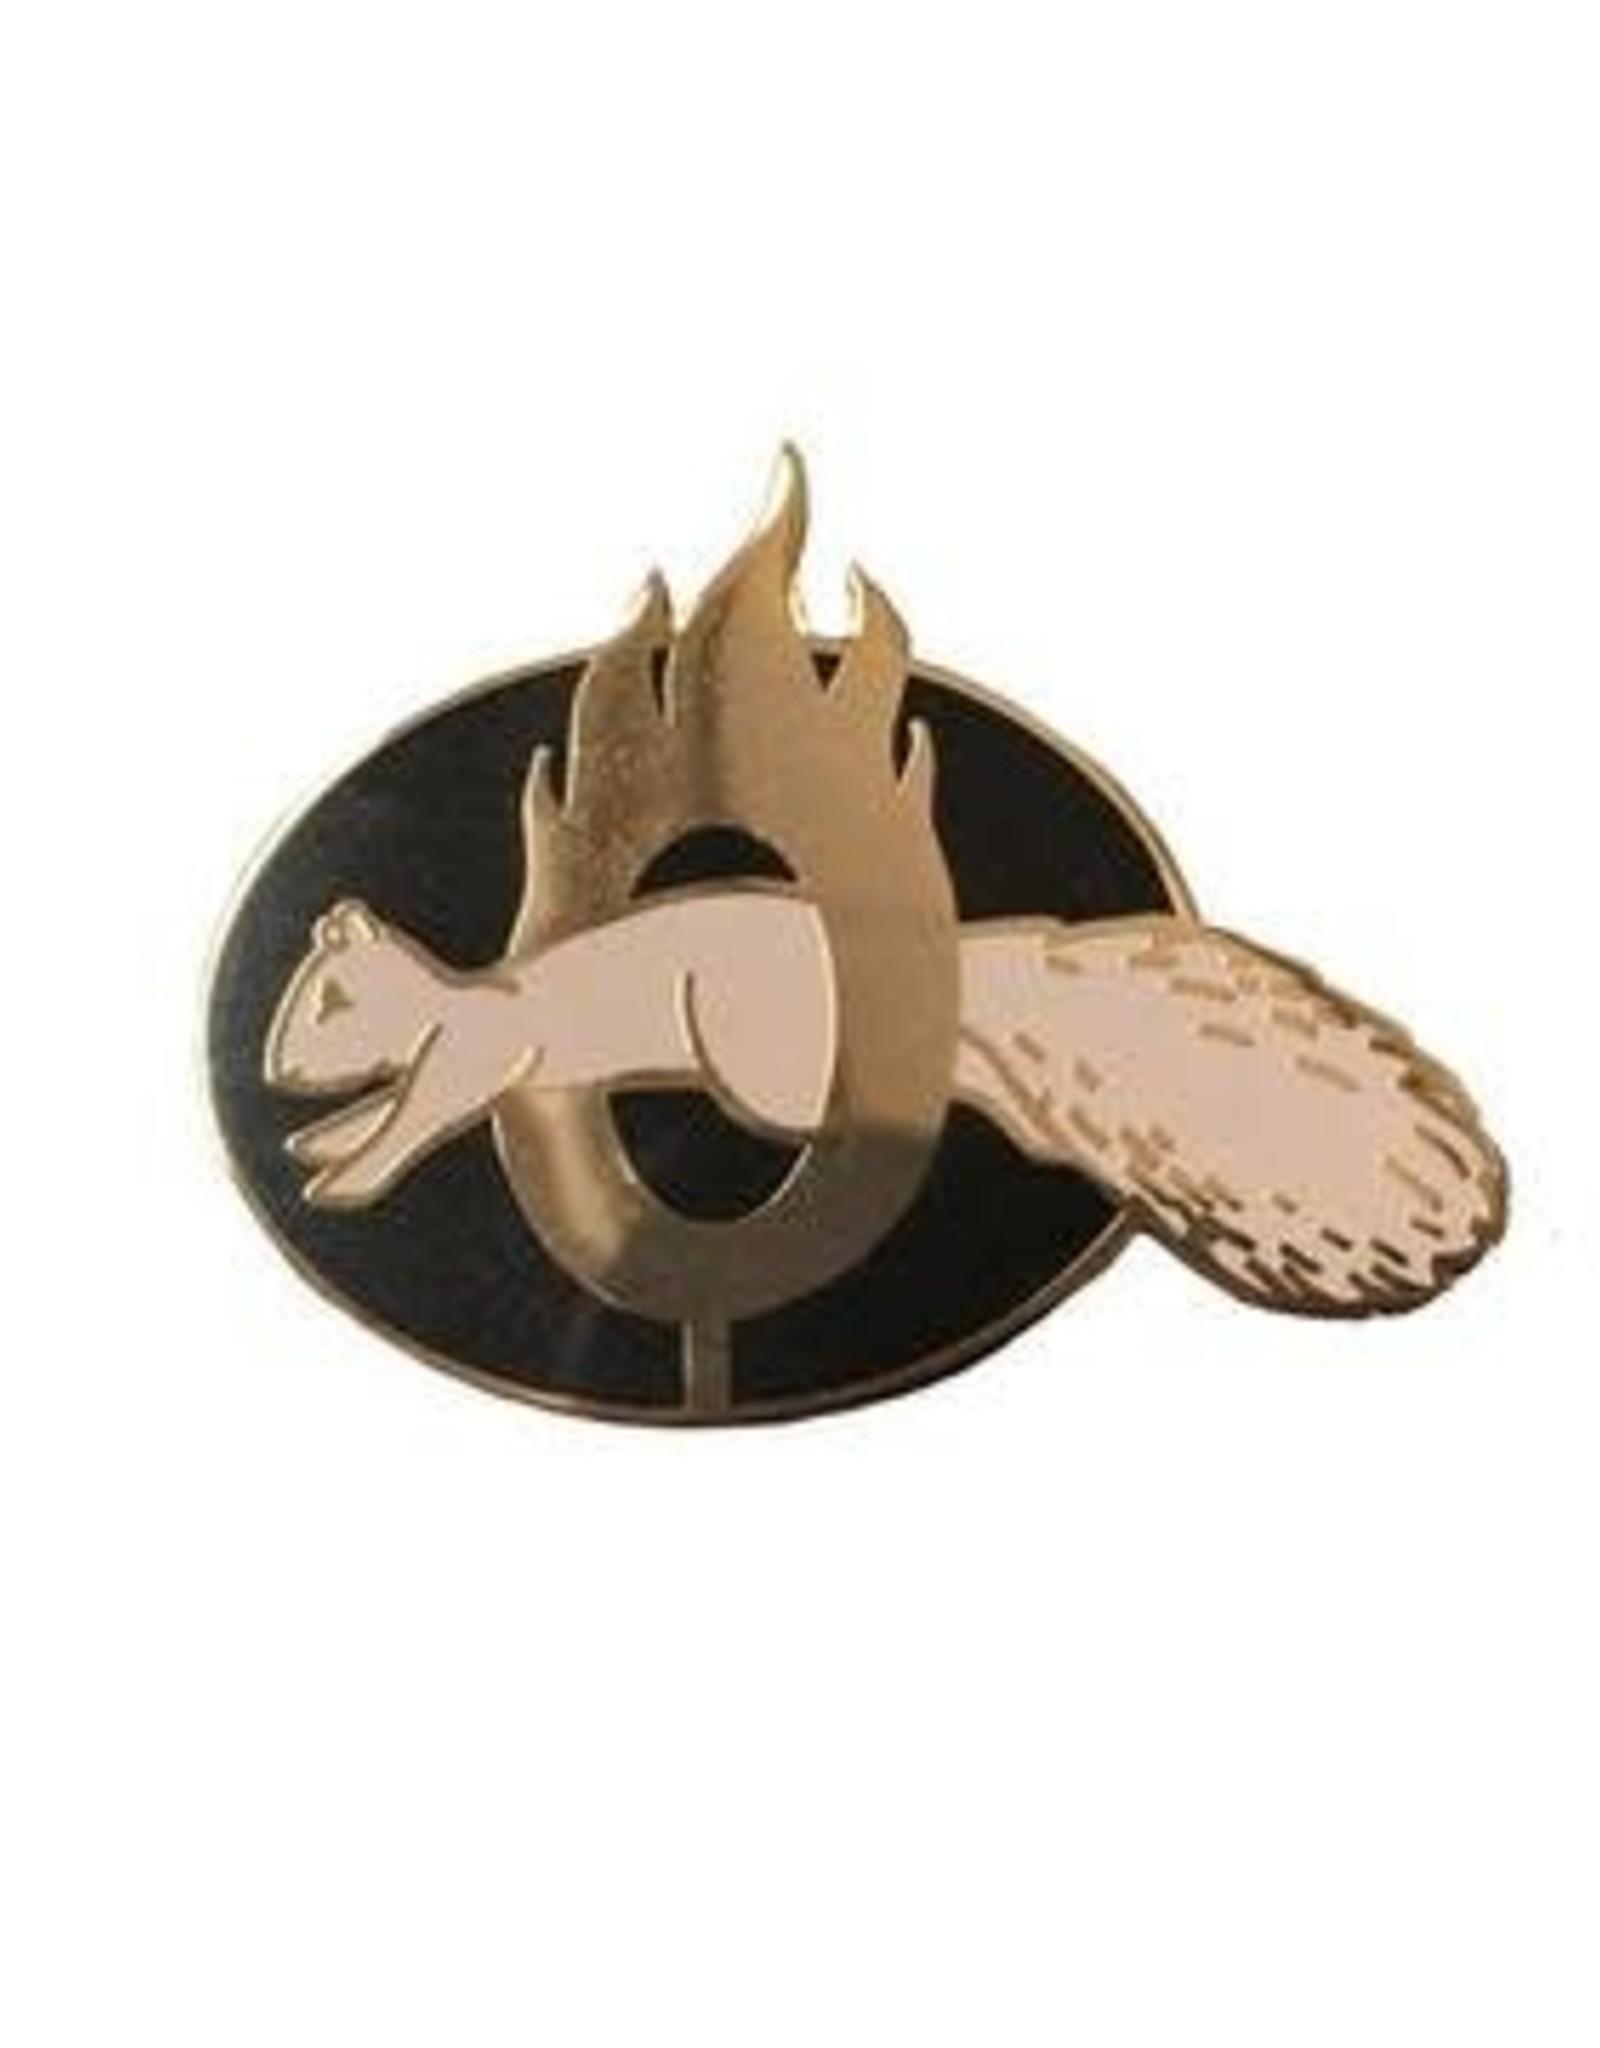 Frog & Toad Press Brave Squirrel Enamel Pin